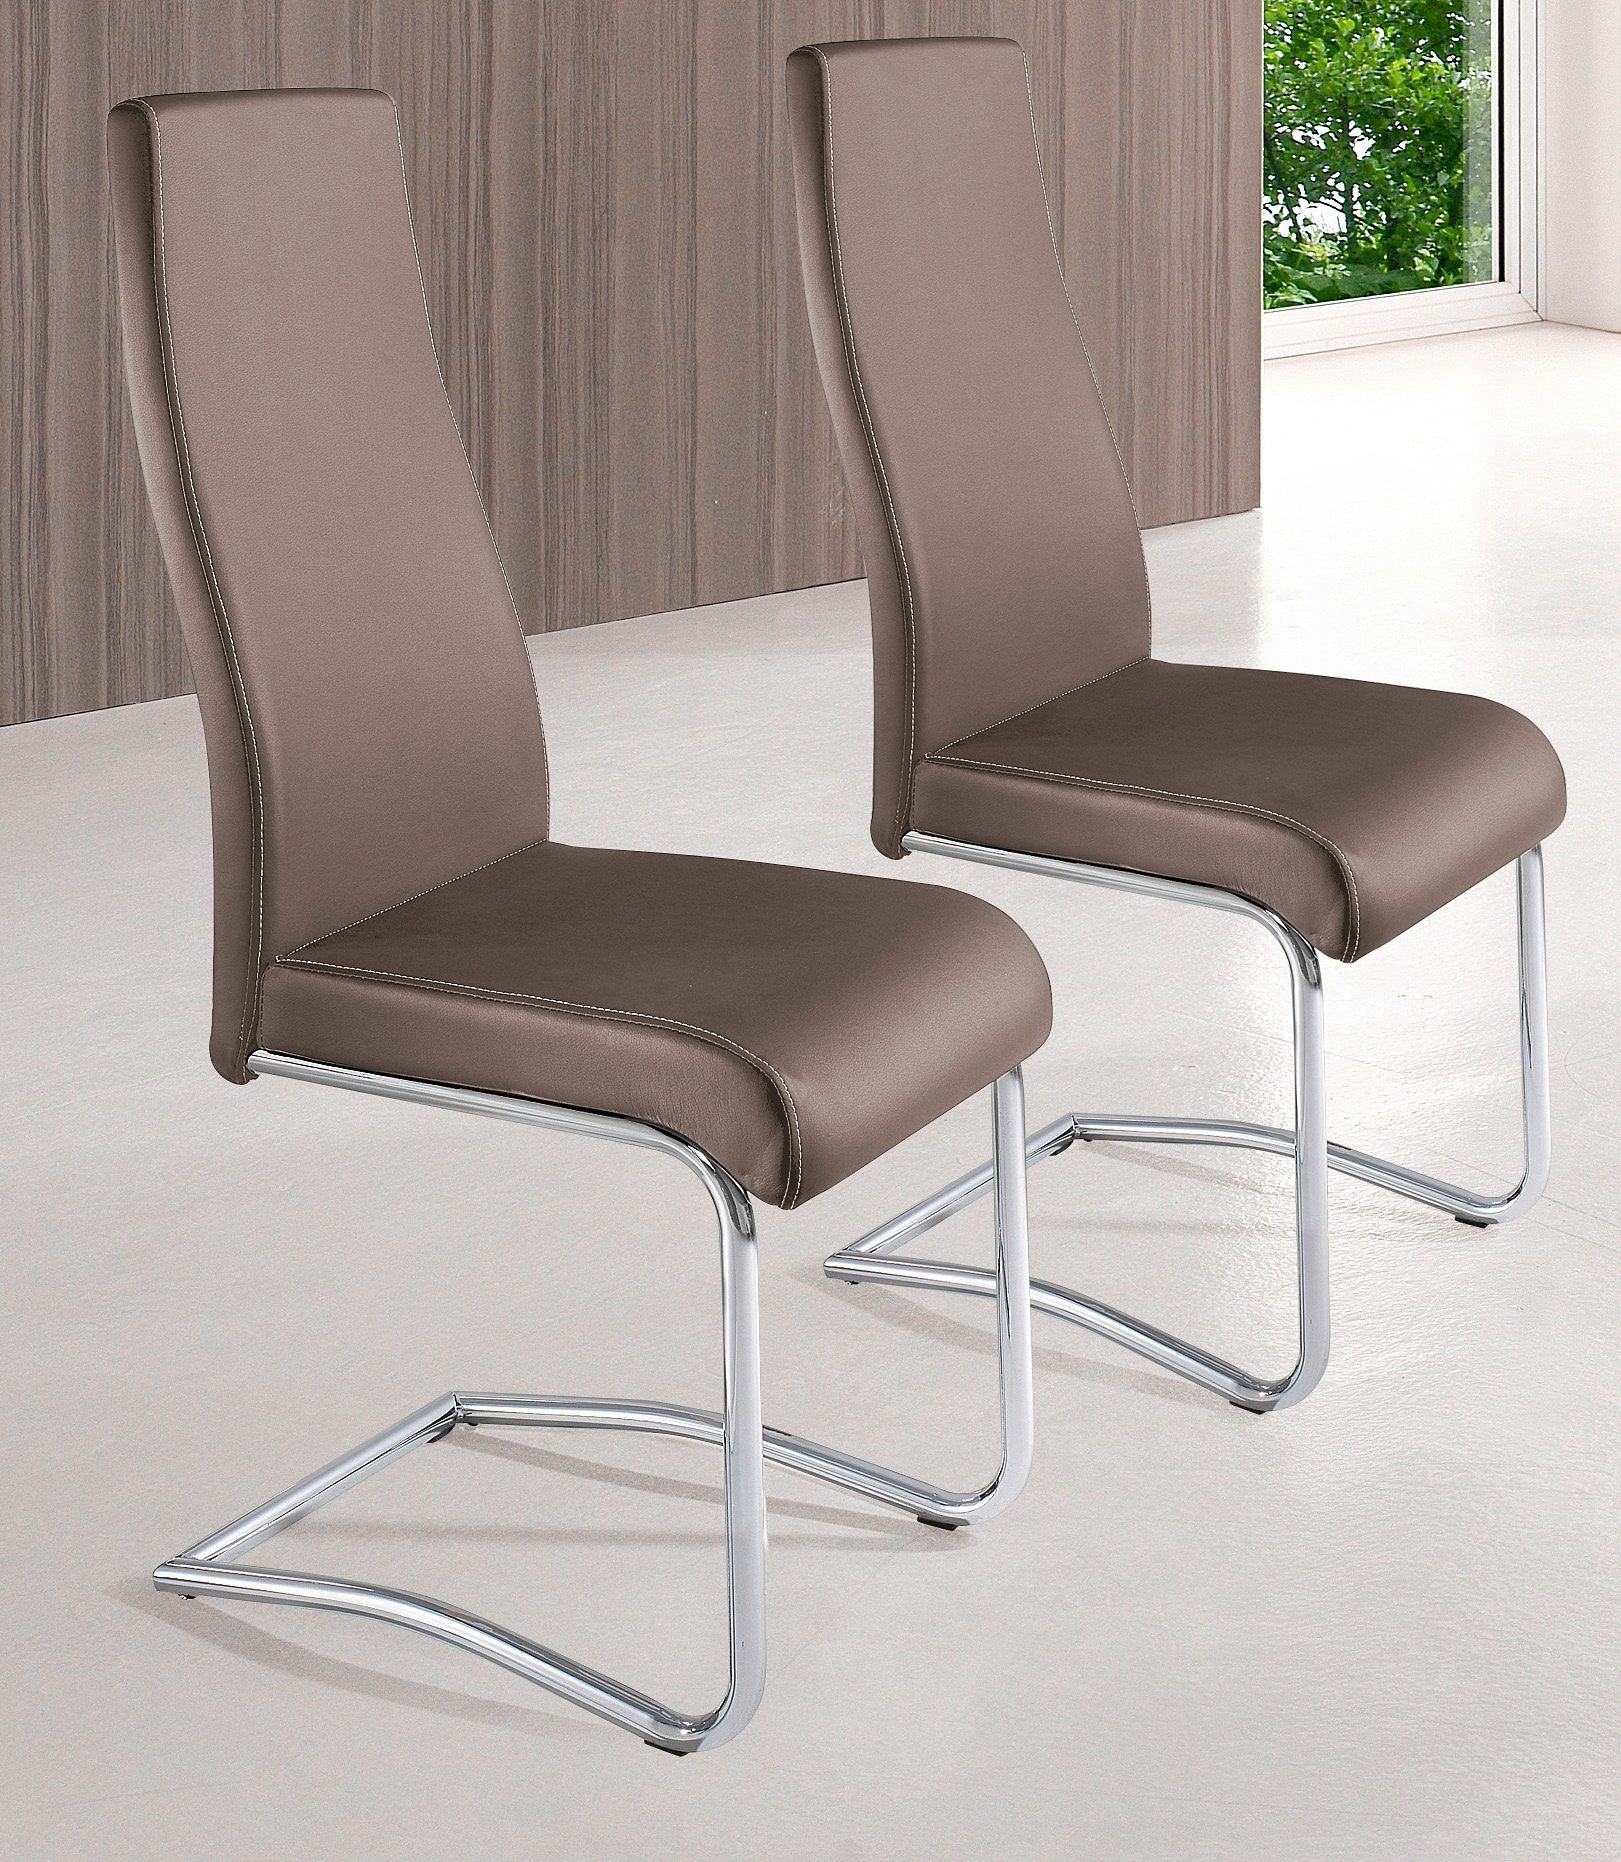 Stühle (2 Stck.) beige, Gestell Schwinger Rundrohr chrom, Kunstleder ...